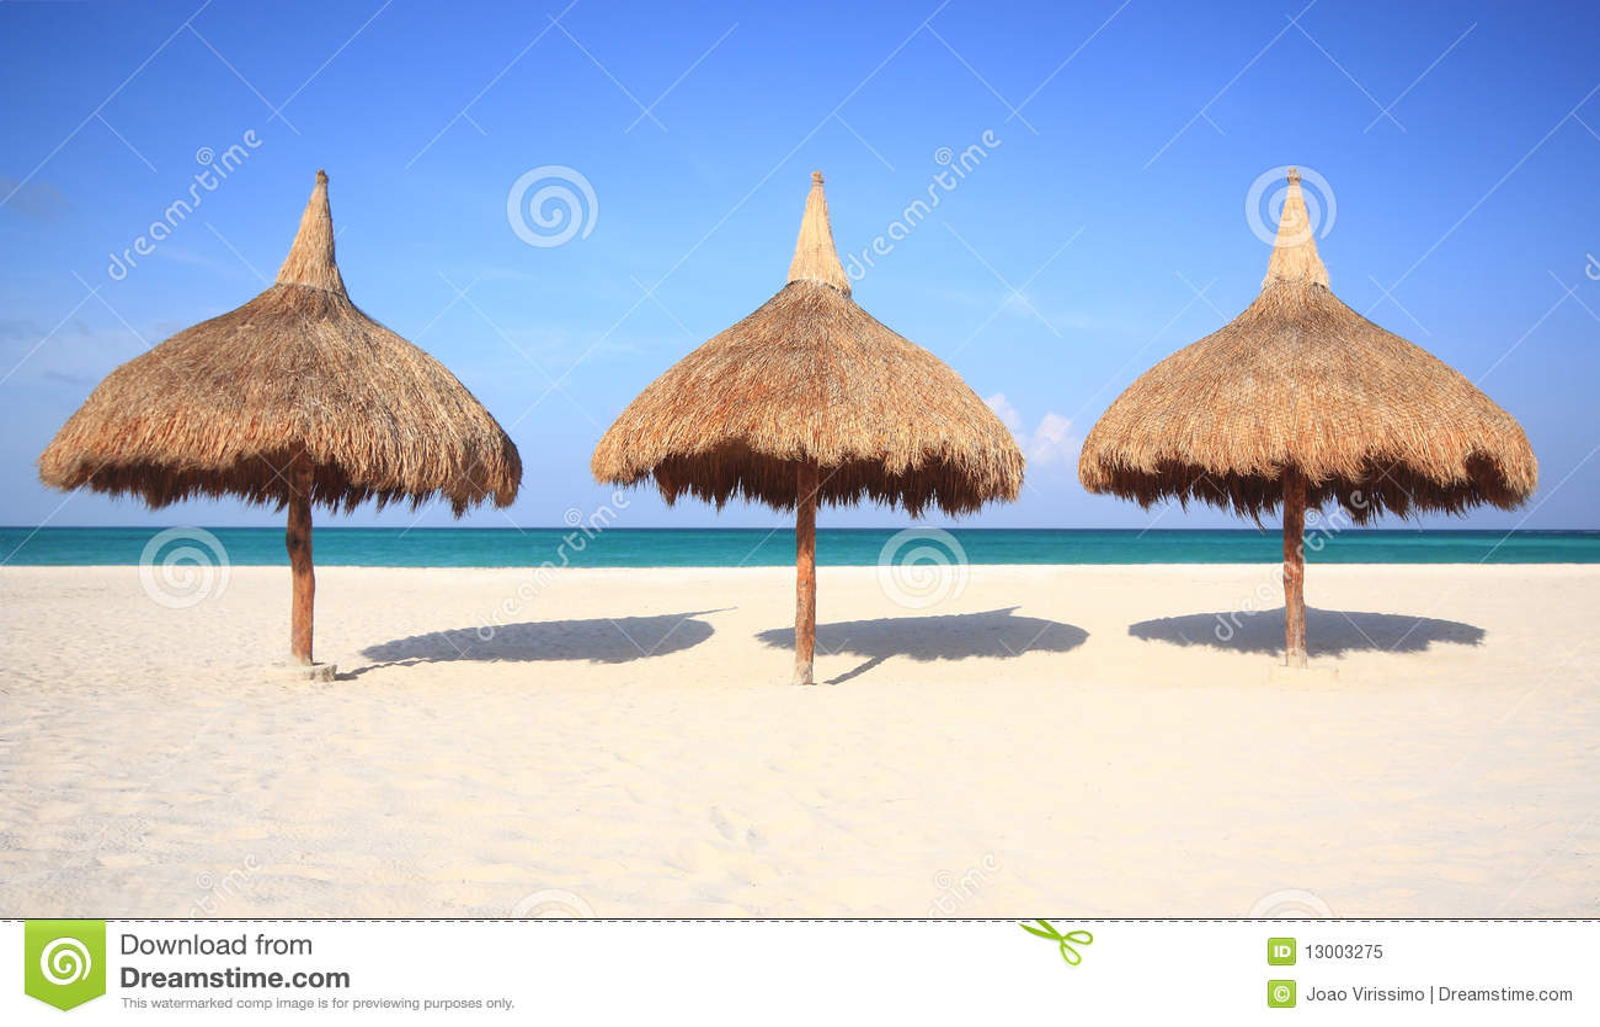 Guarda-chuvas de praia